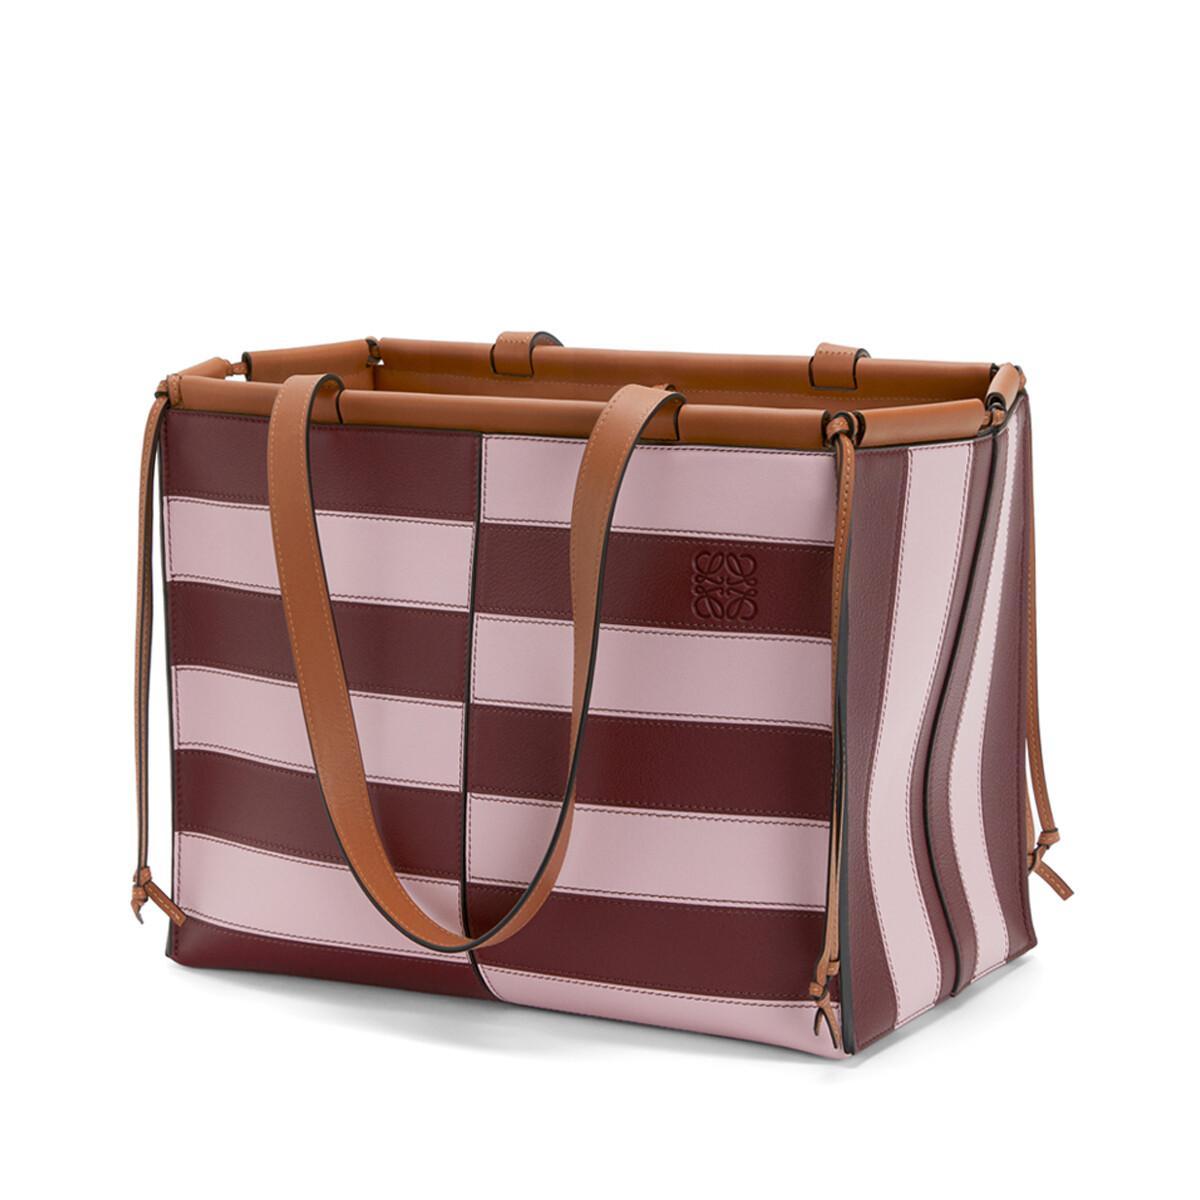 LOEWE Cushion Tote Rugby Pastel Pink/Wine front